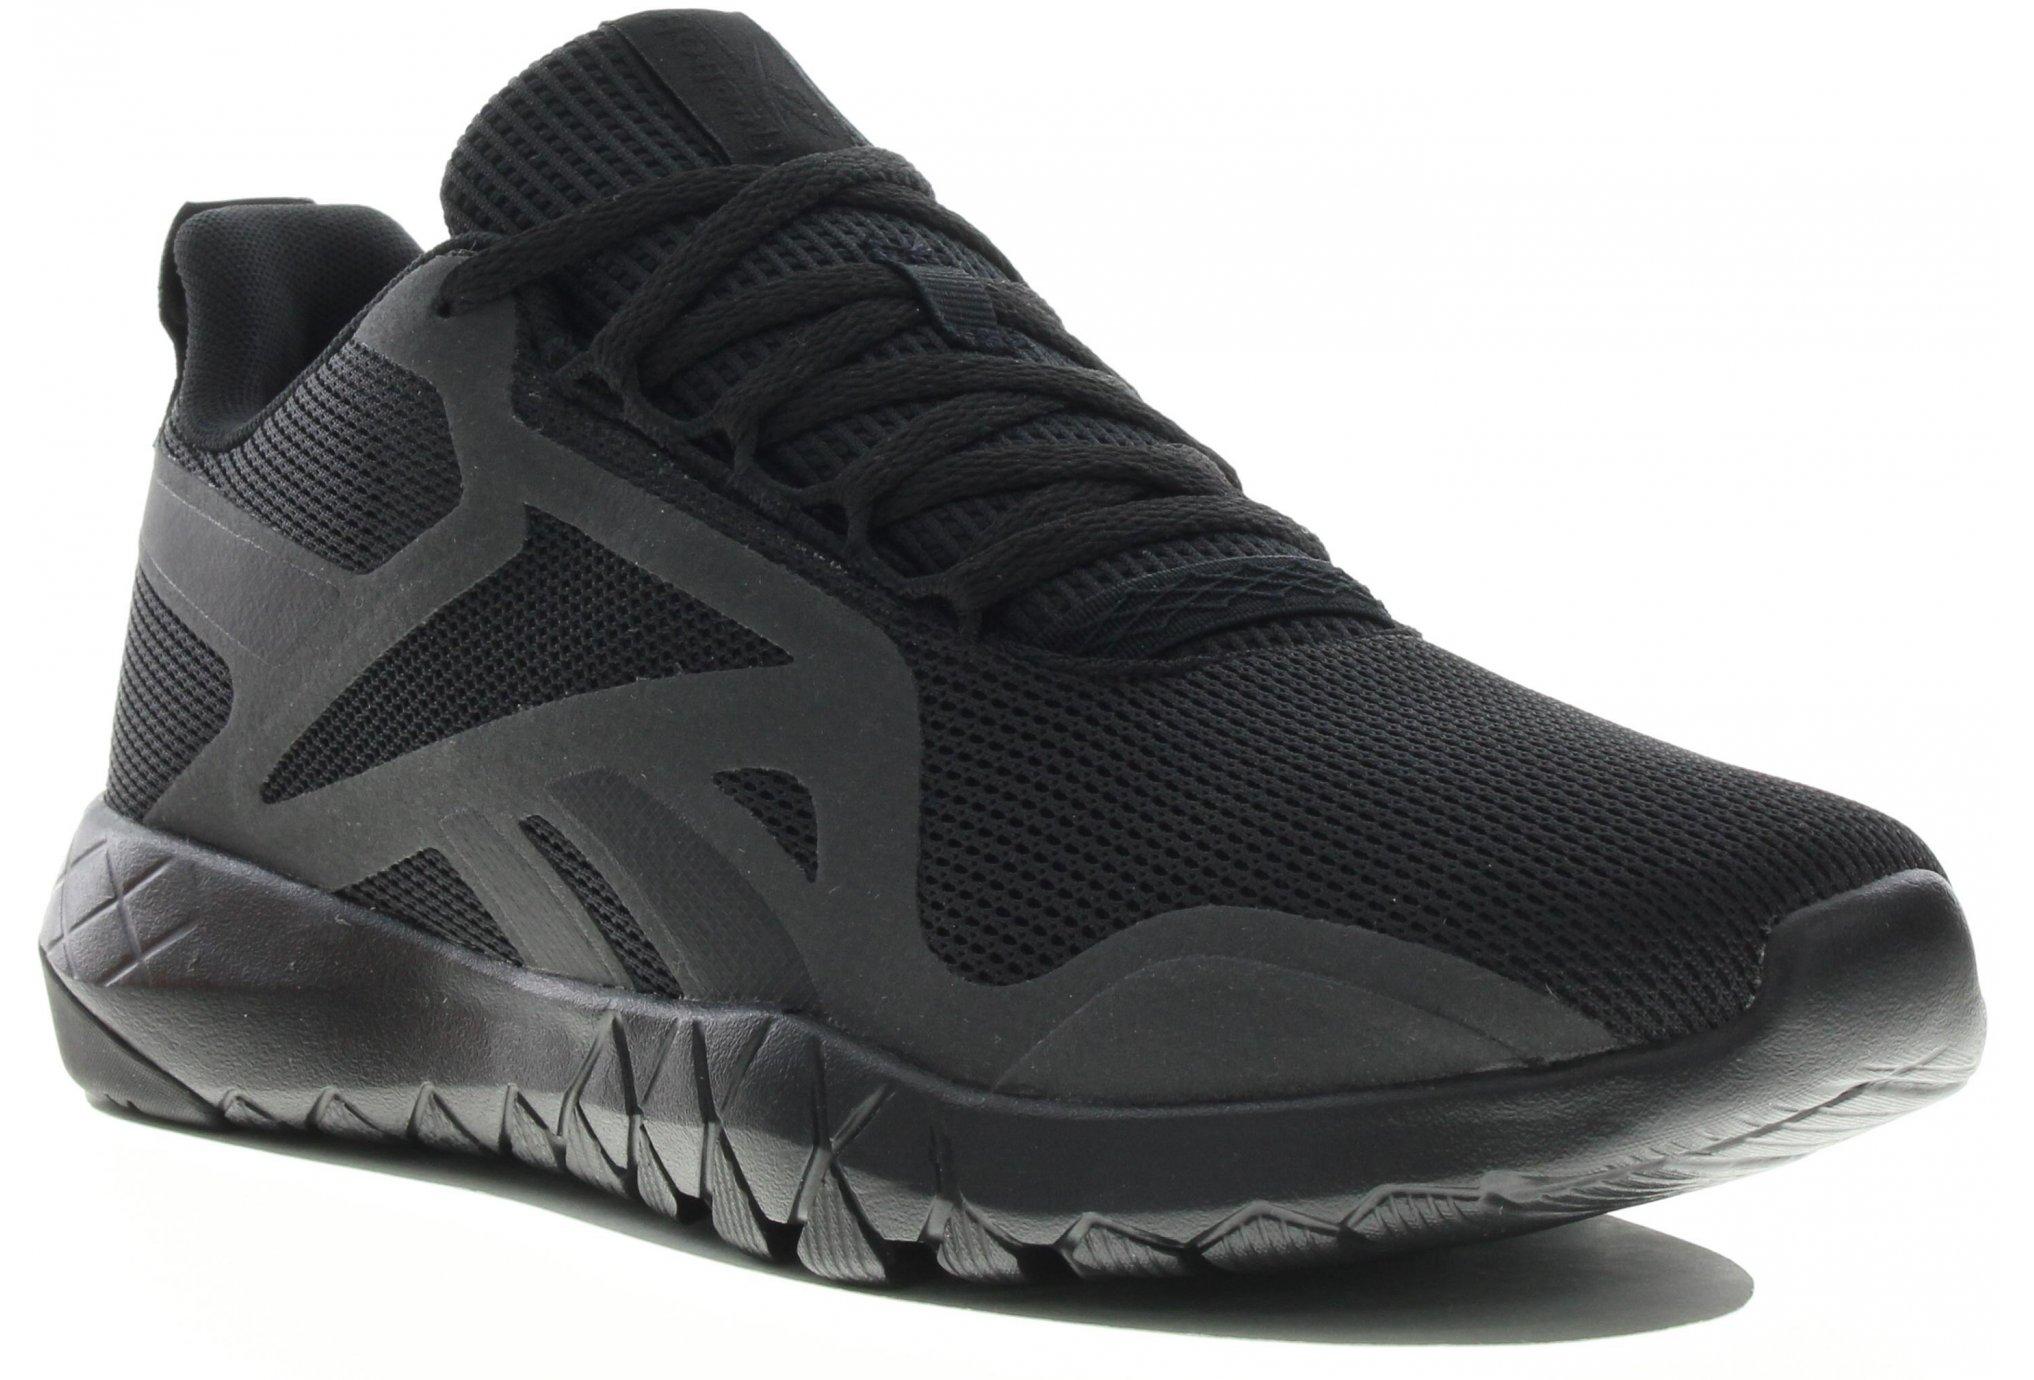 Reebok Flexagon Force 3.0 W Diététique Chaussures femme